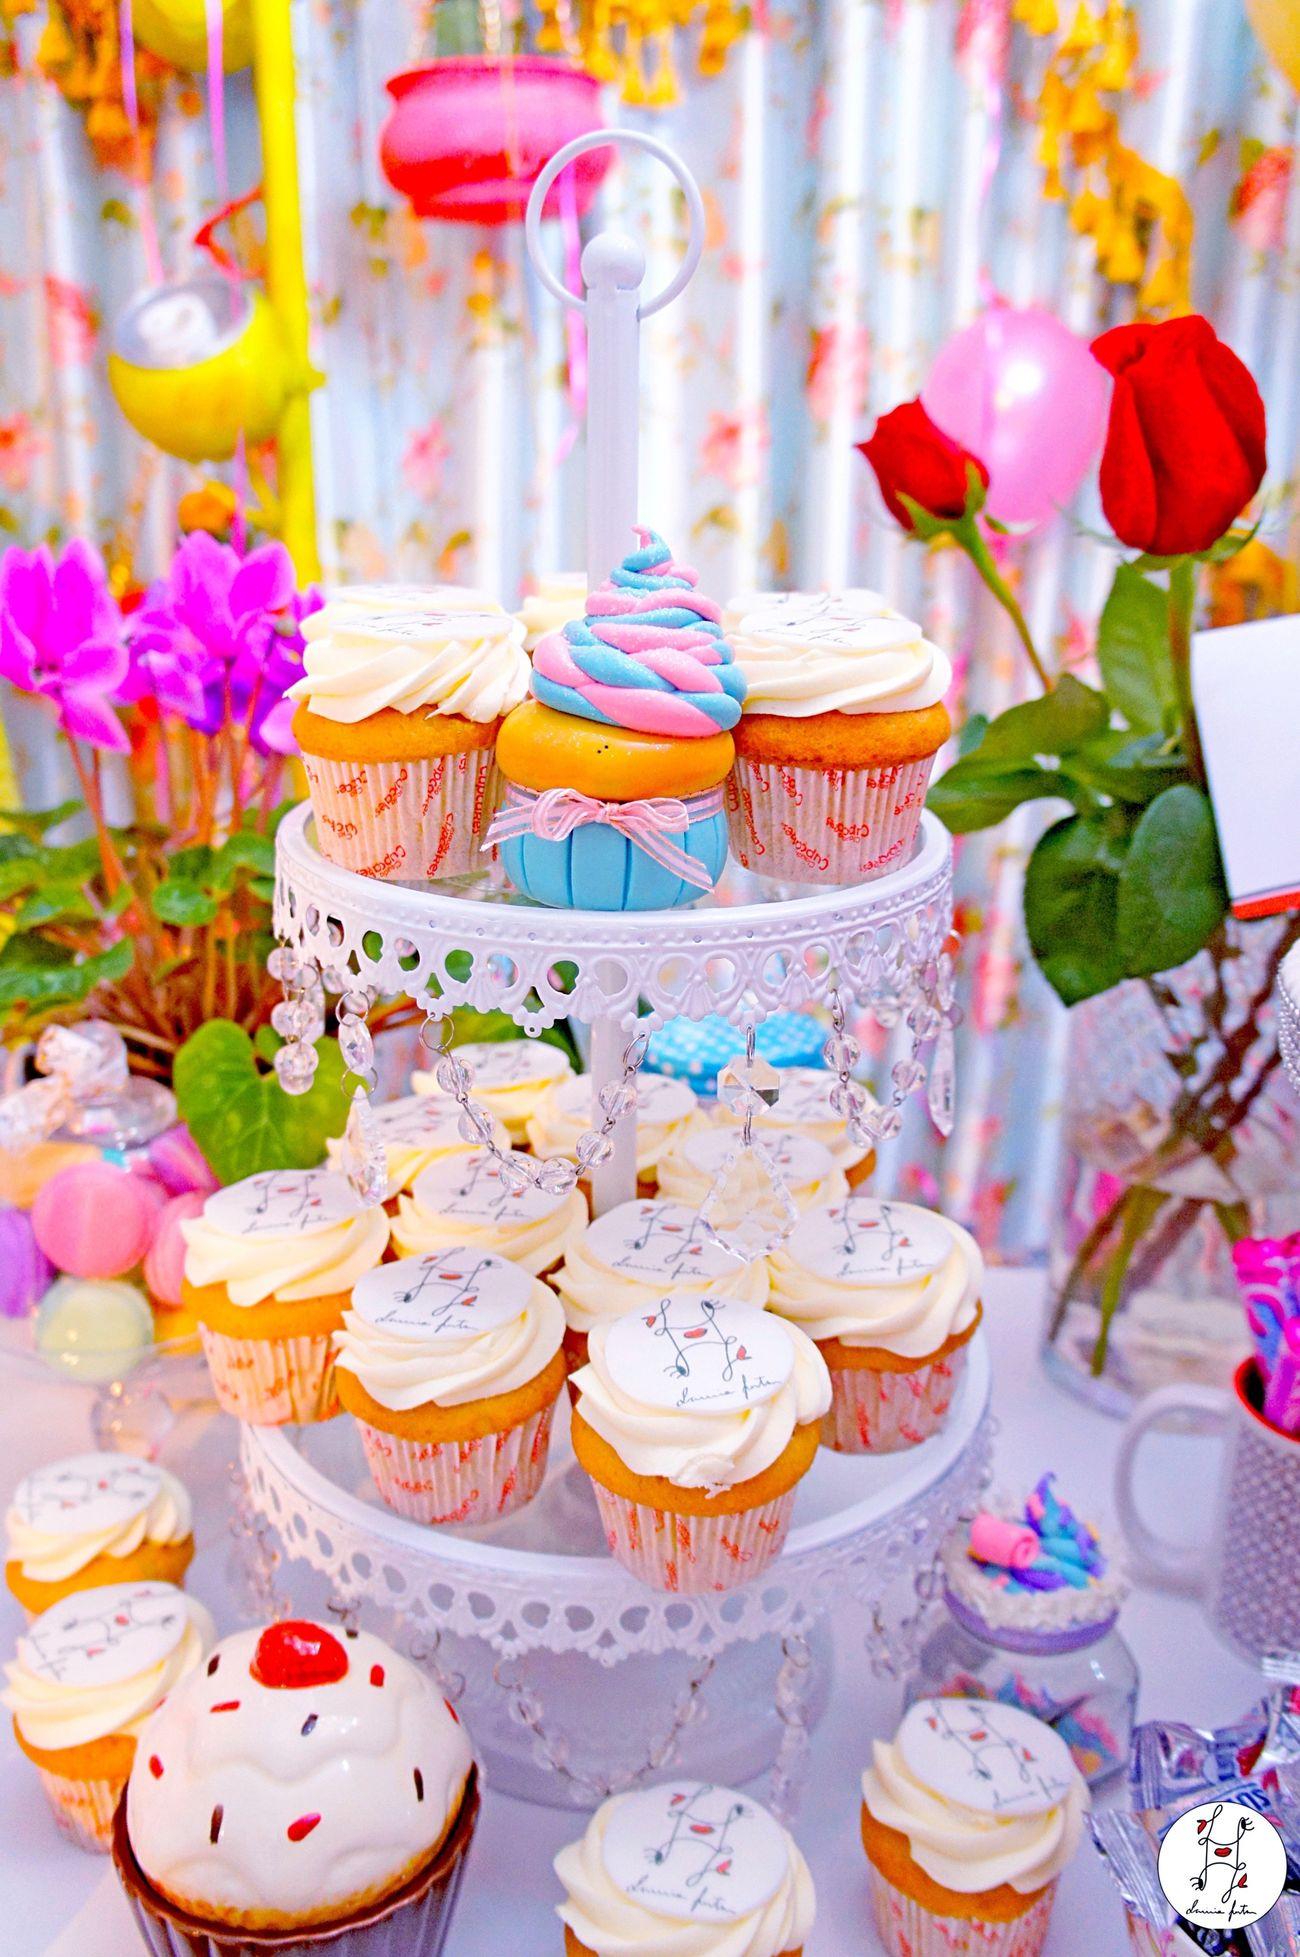 Vanilla cupcake tower☺️🍰✨ Laviniafenton Fantasy Eye4photography  Freshness Sweet Food Multi Colored Dessert Arrangement Tower Cupcakes Vanilla Pastel Pastel Power Fluo  Boutique Handmade Monogram